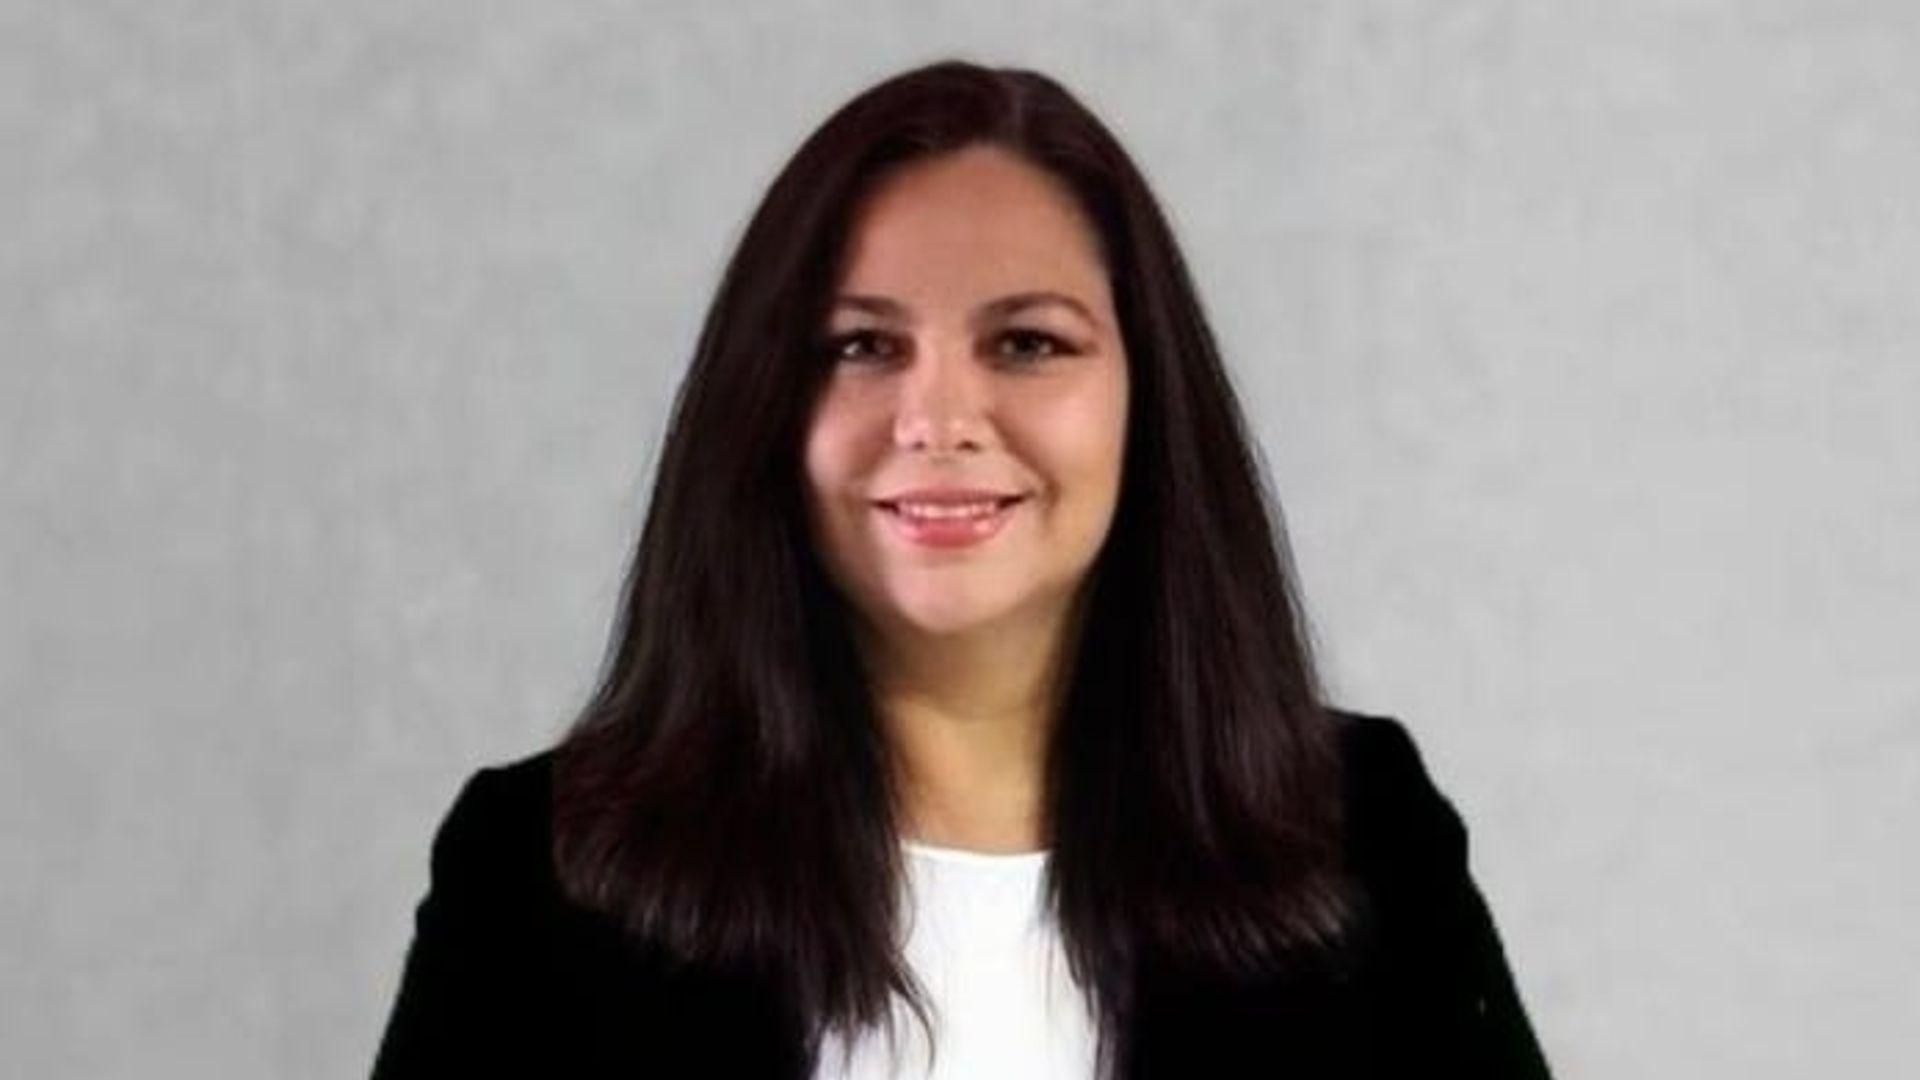 Elodia Cárdenas Gómez, candidata del Partido Verde en Querétaro, falleció (Foto: Facebook / Elodia Cárdenas Gómez)